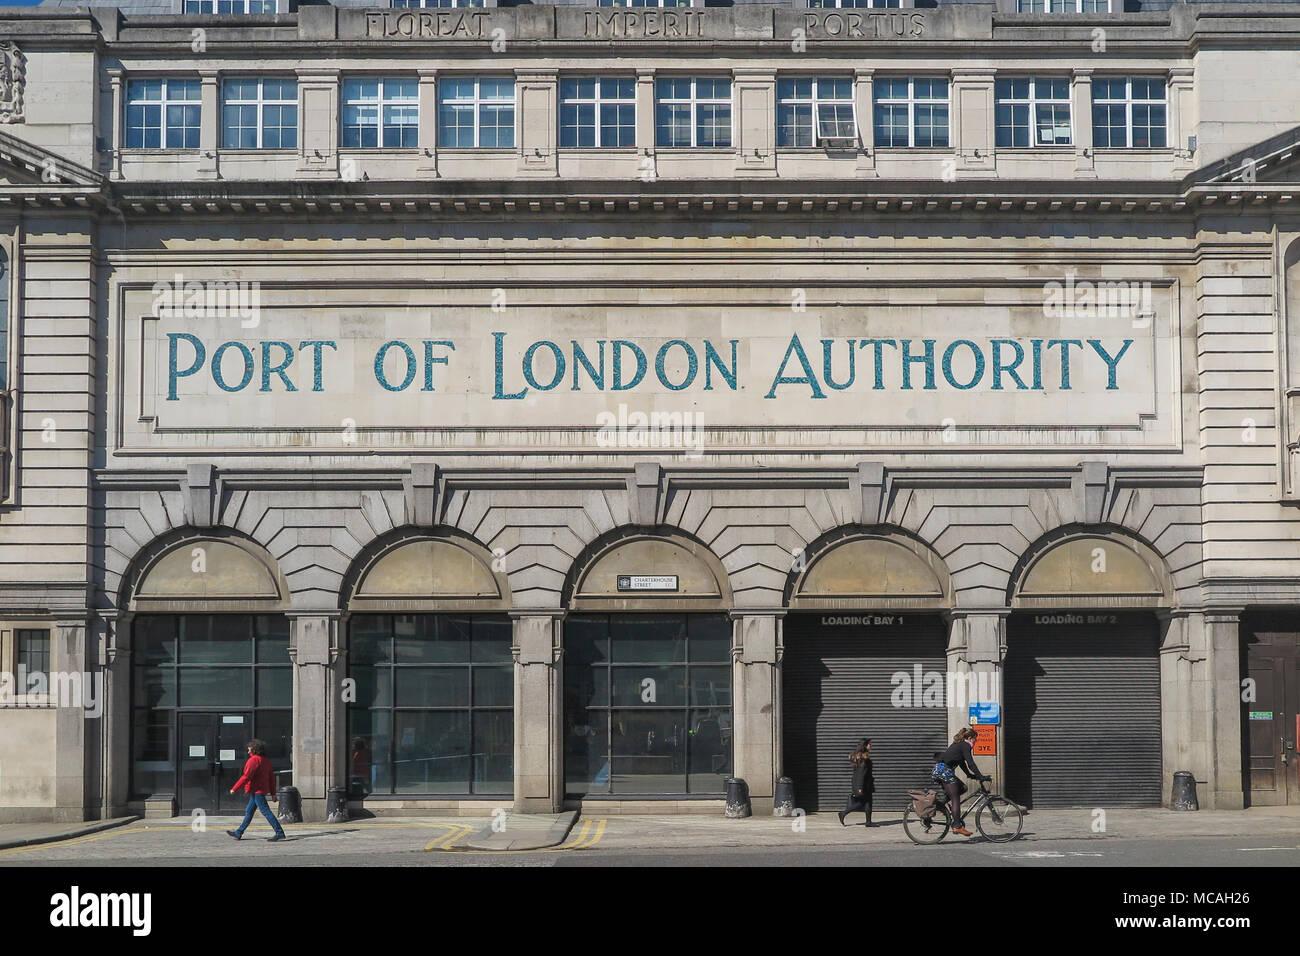 Port of London Authority sign on a historic building in Charterhouse Street London England, near Smithfields market - Stock Image